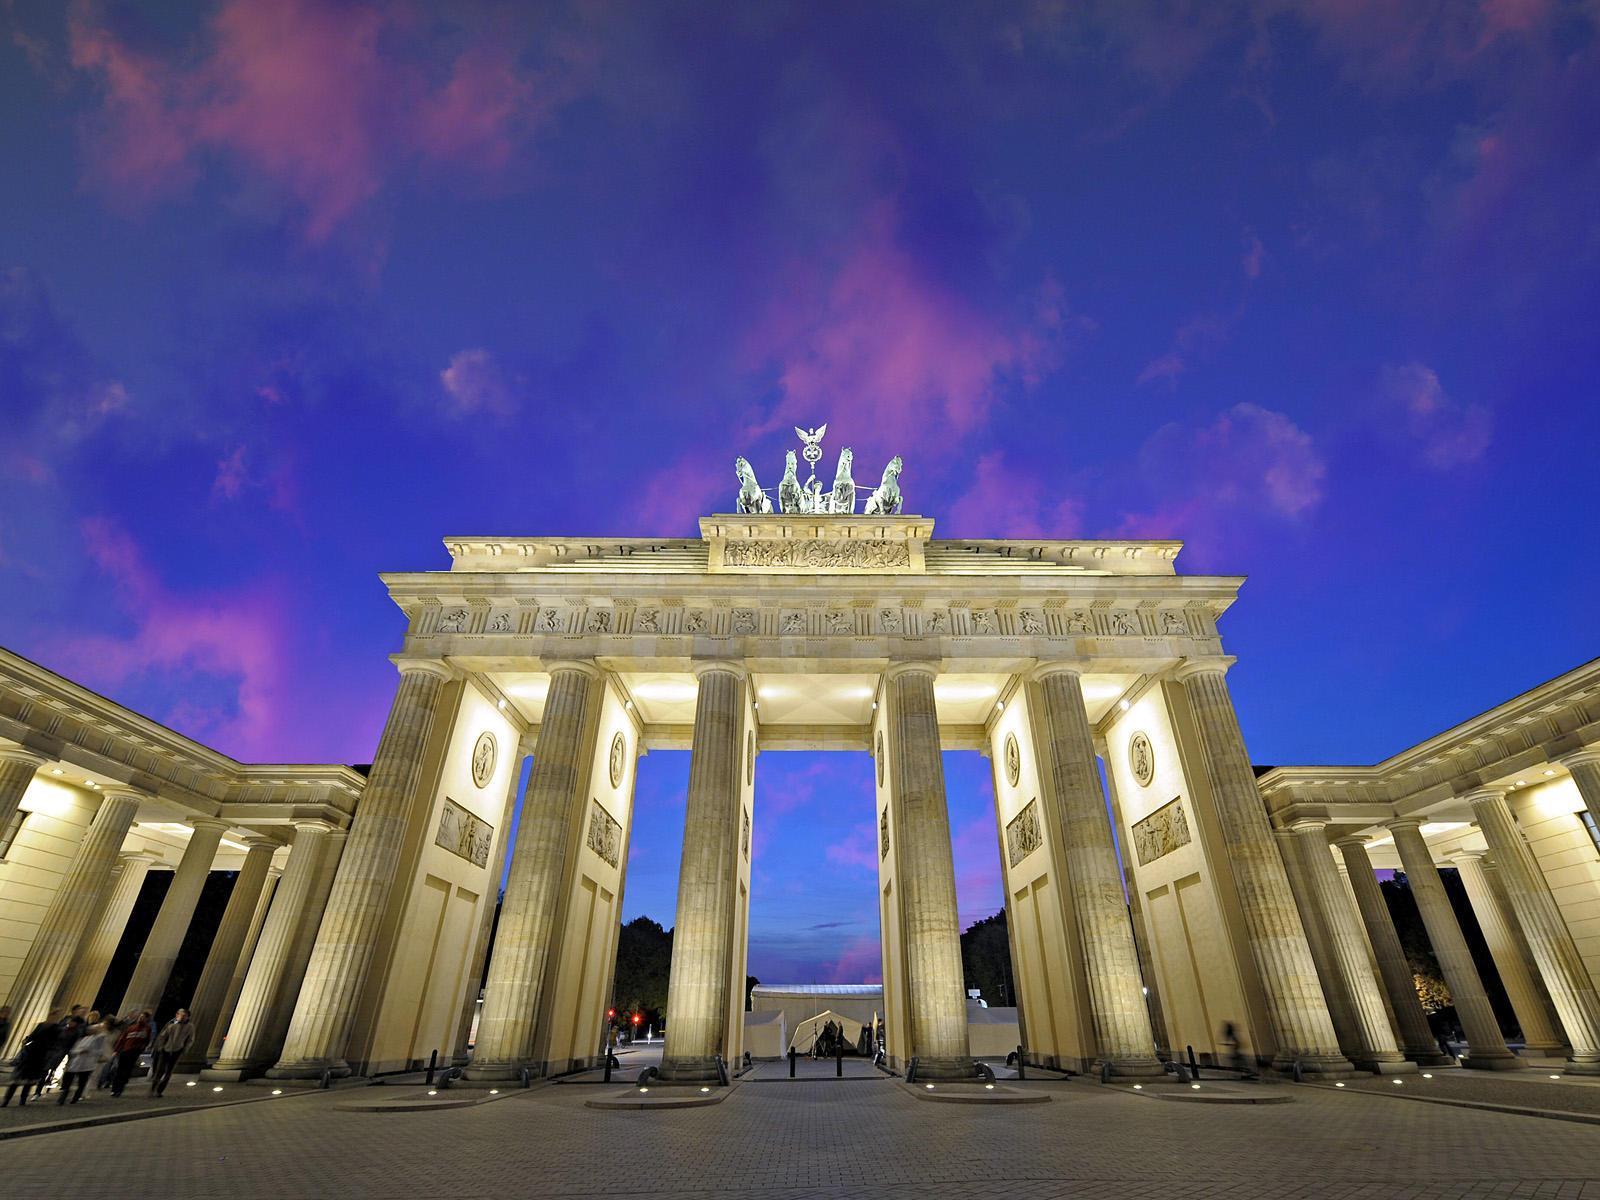 brandenburge_gate